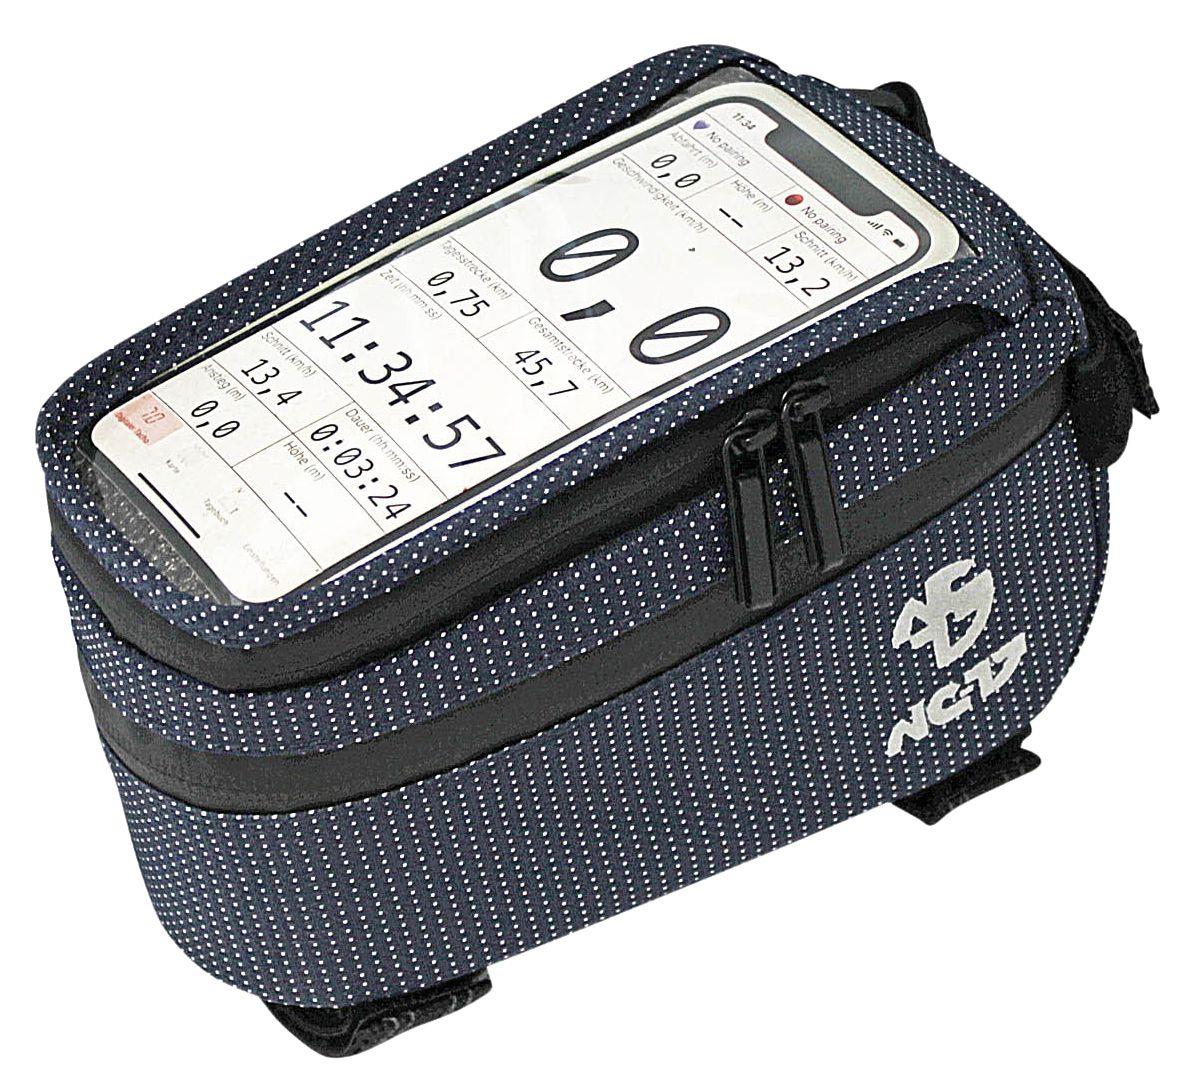 kartenhalter/Lenker: NC-17  Smartphone Tasche Connect Oberrohrtasche